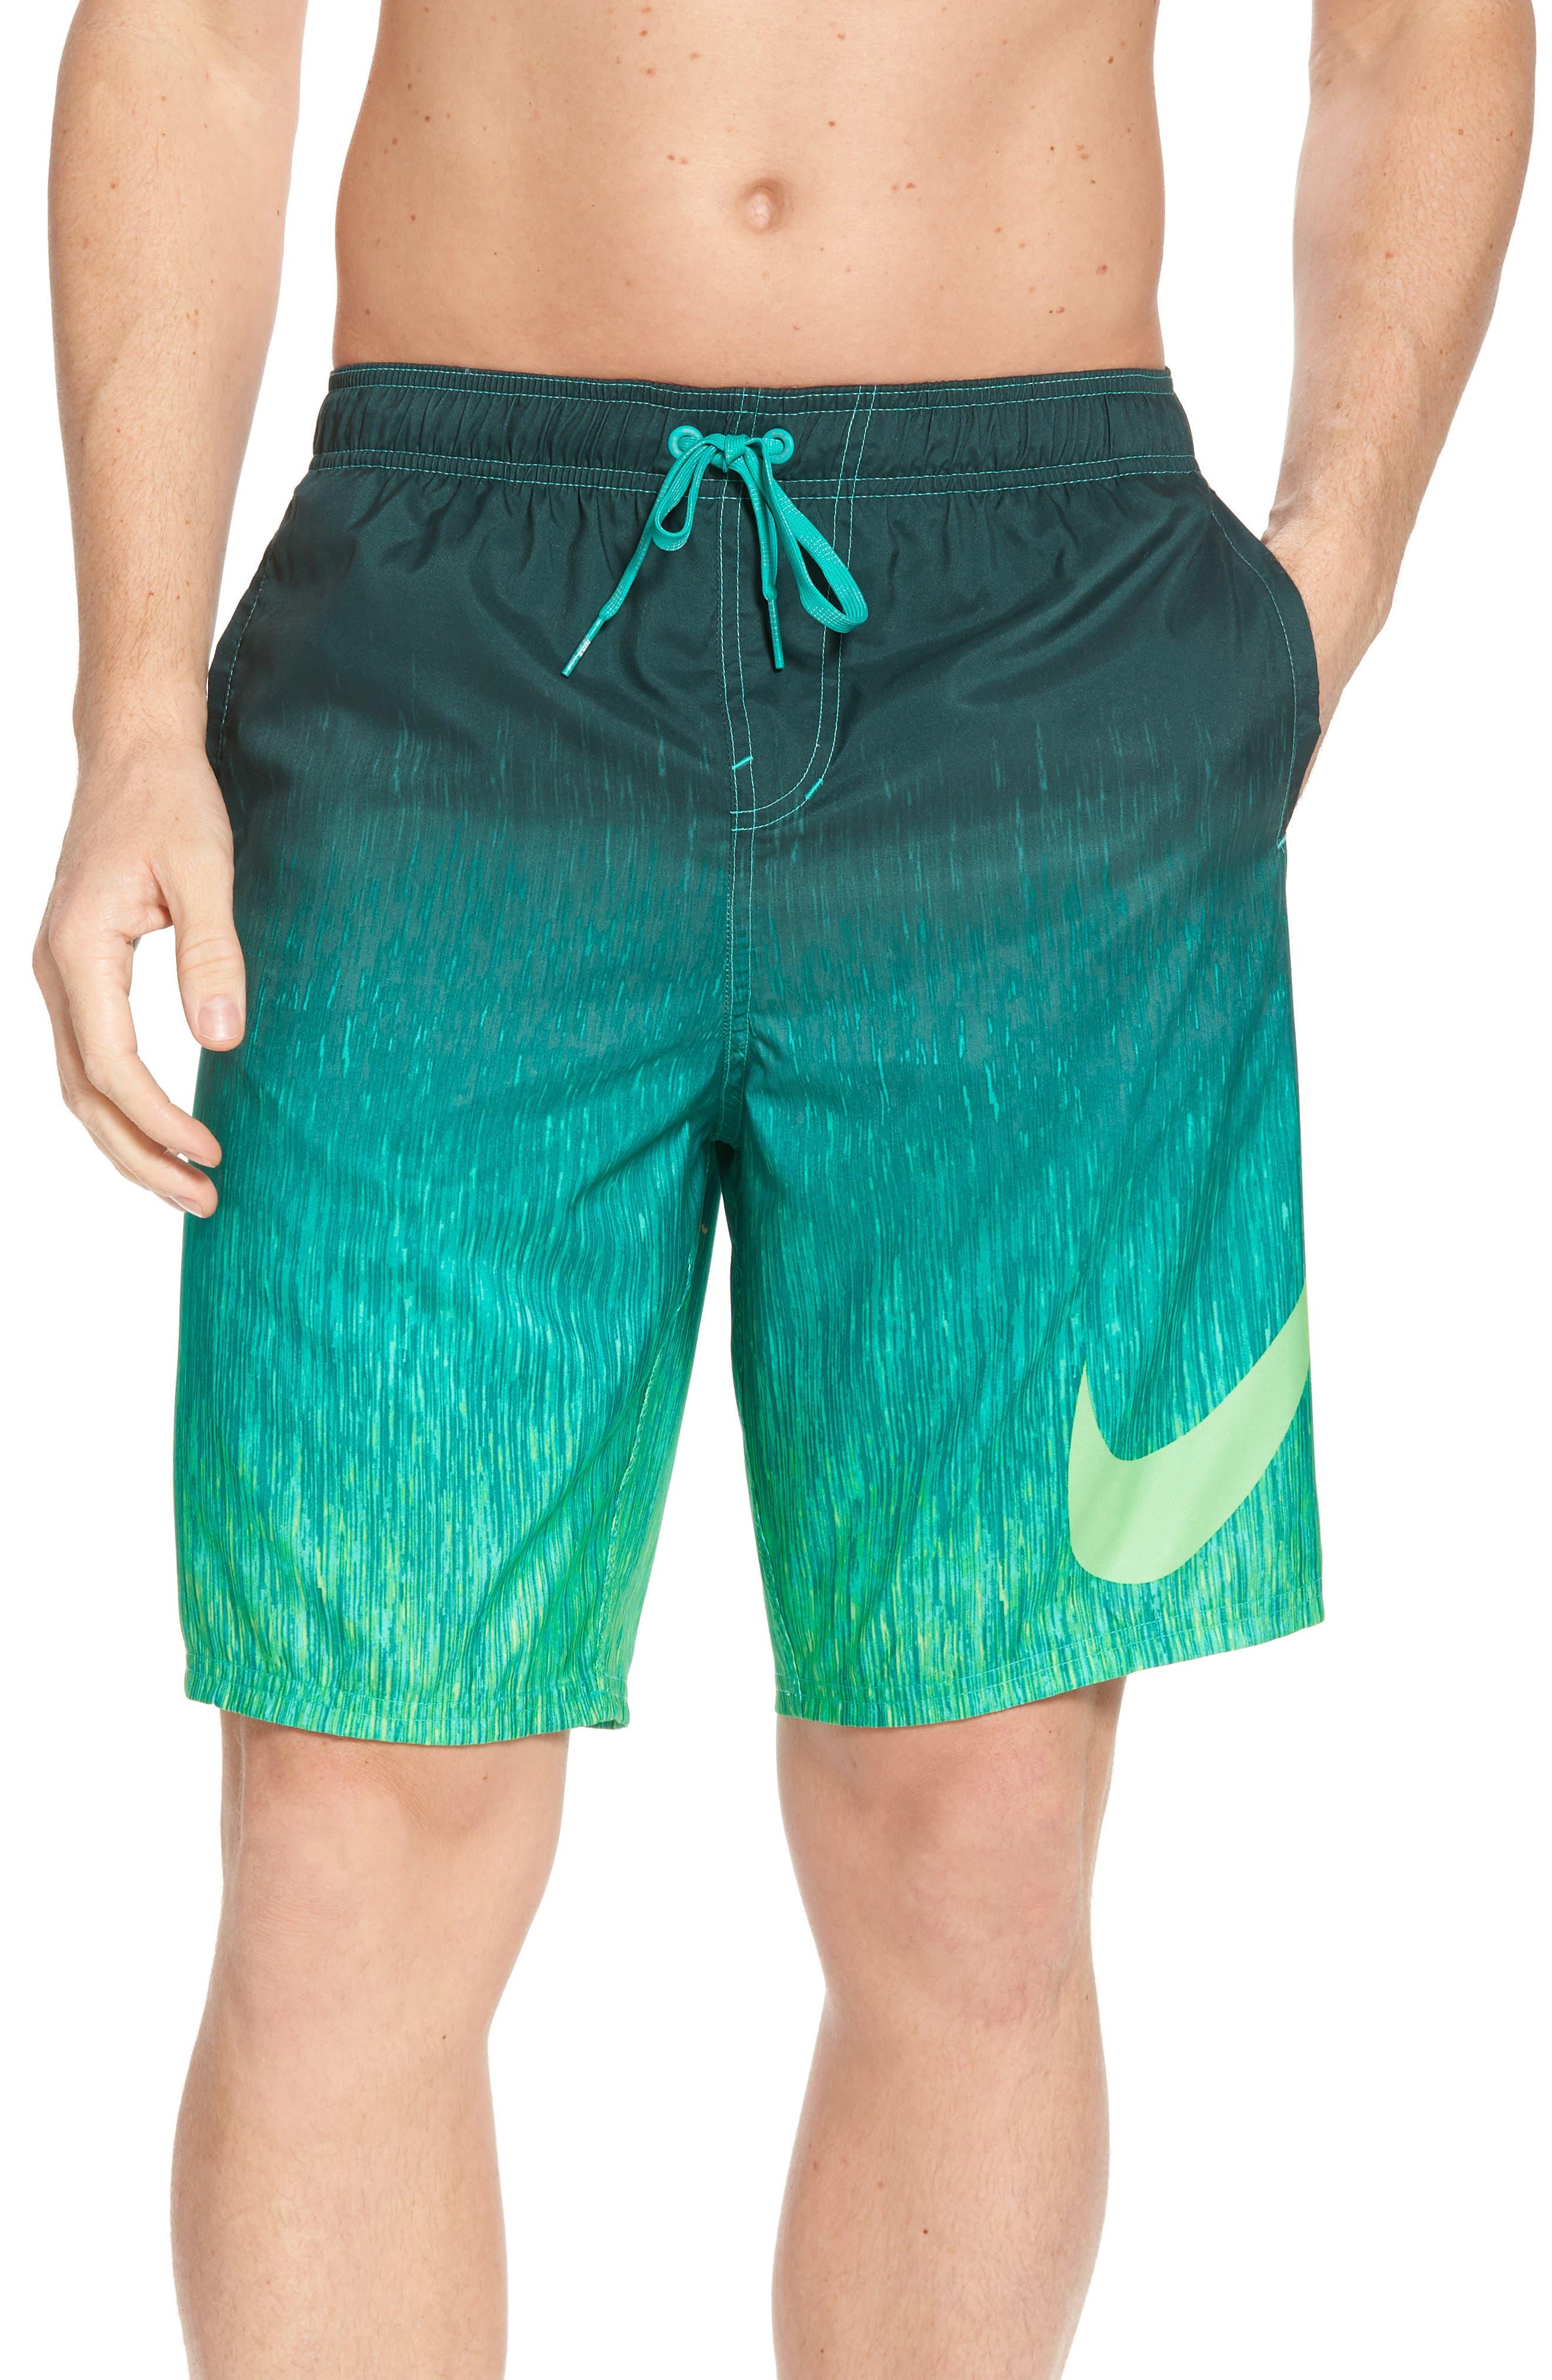 Breaker Swim Trunks,                         Main,                         color,